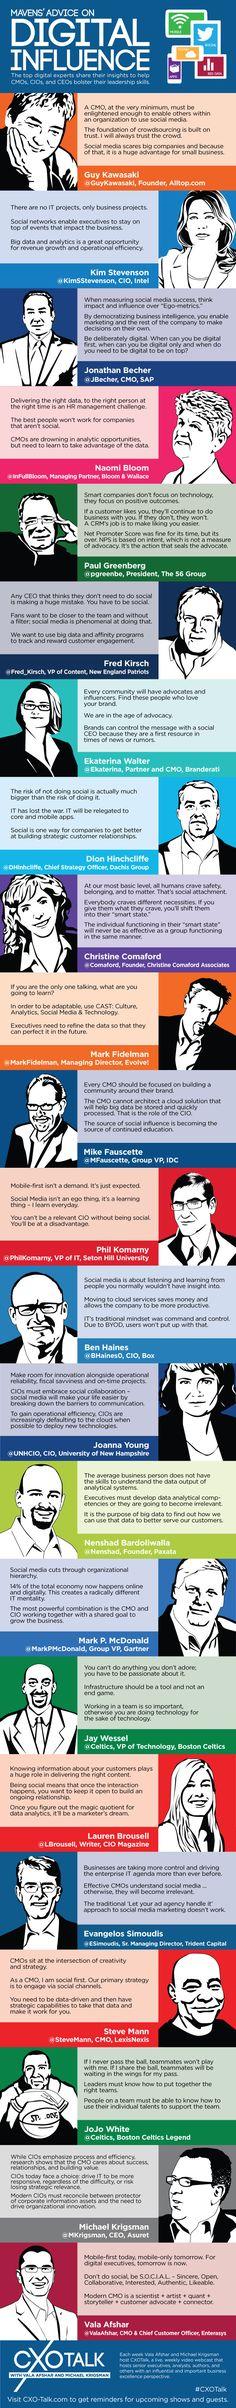 Social Business Leaders Share Advice on Digital Influence image